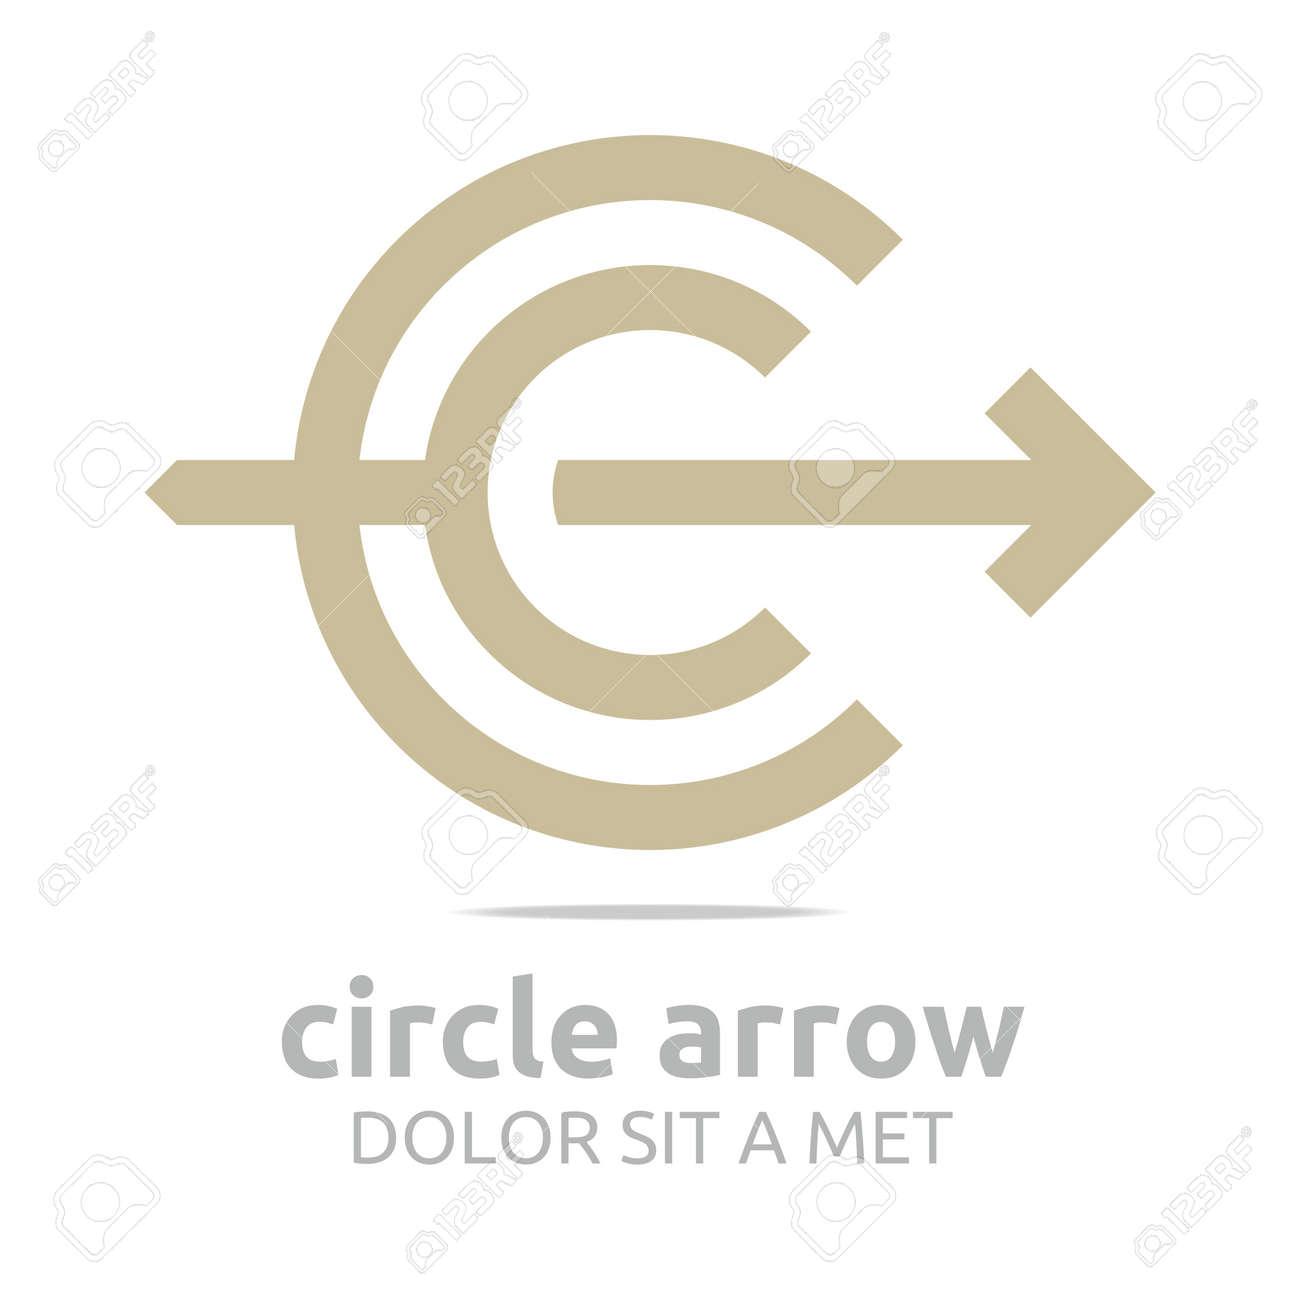 Logo design letter c arrow brown icon symbol abstract vector royalty logo design letter c arrow brown icon symbol abstract vector stock vector 45413139 biocorpaavc Images